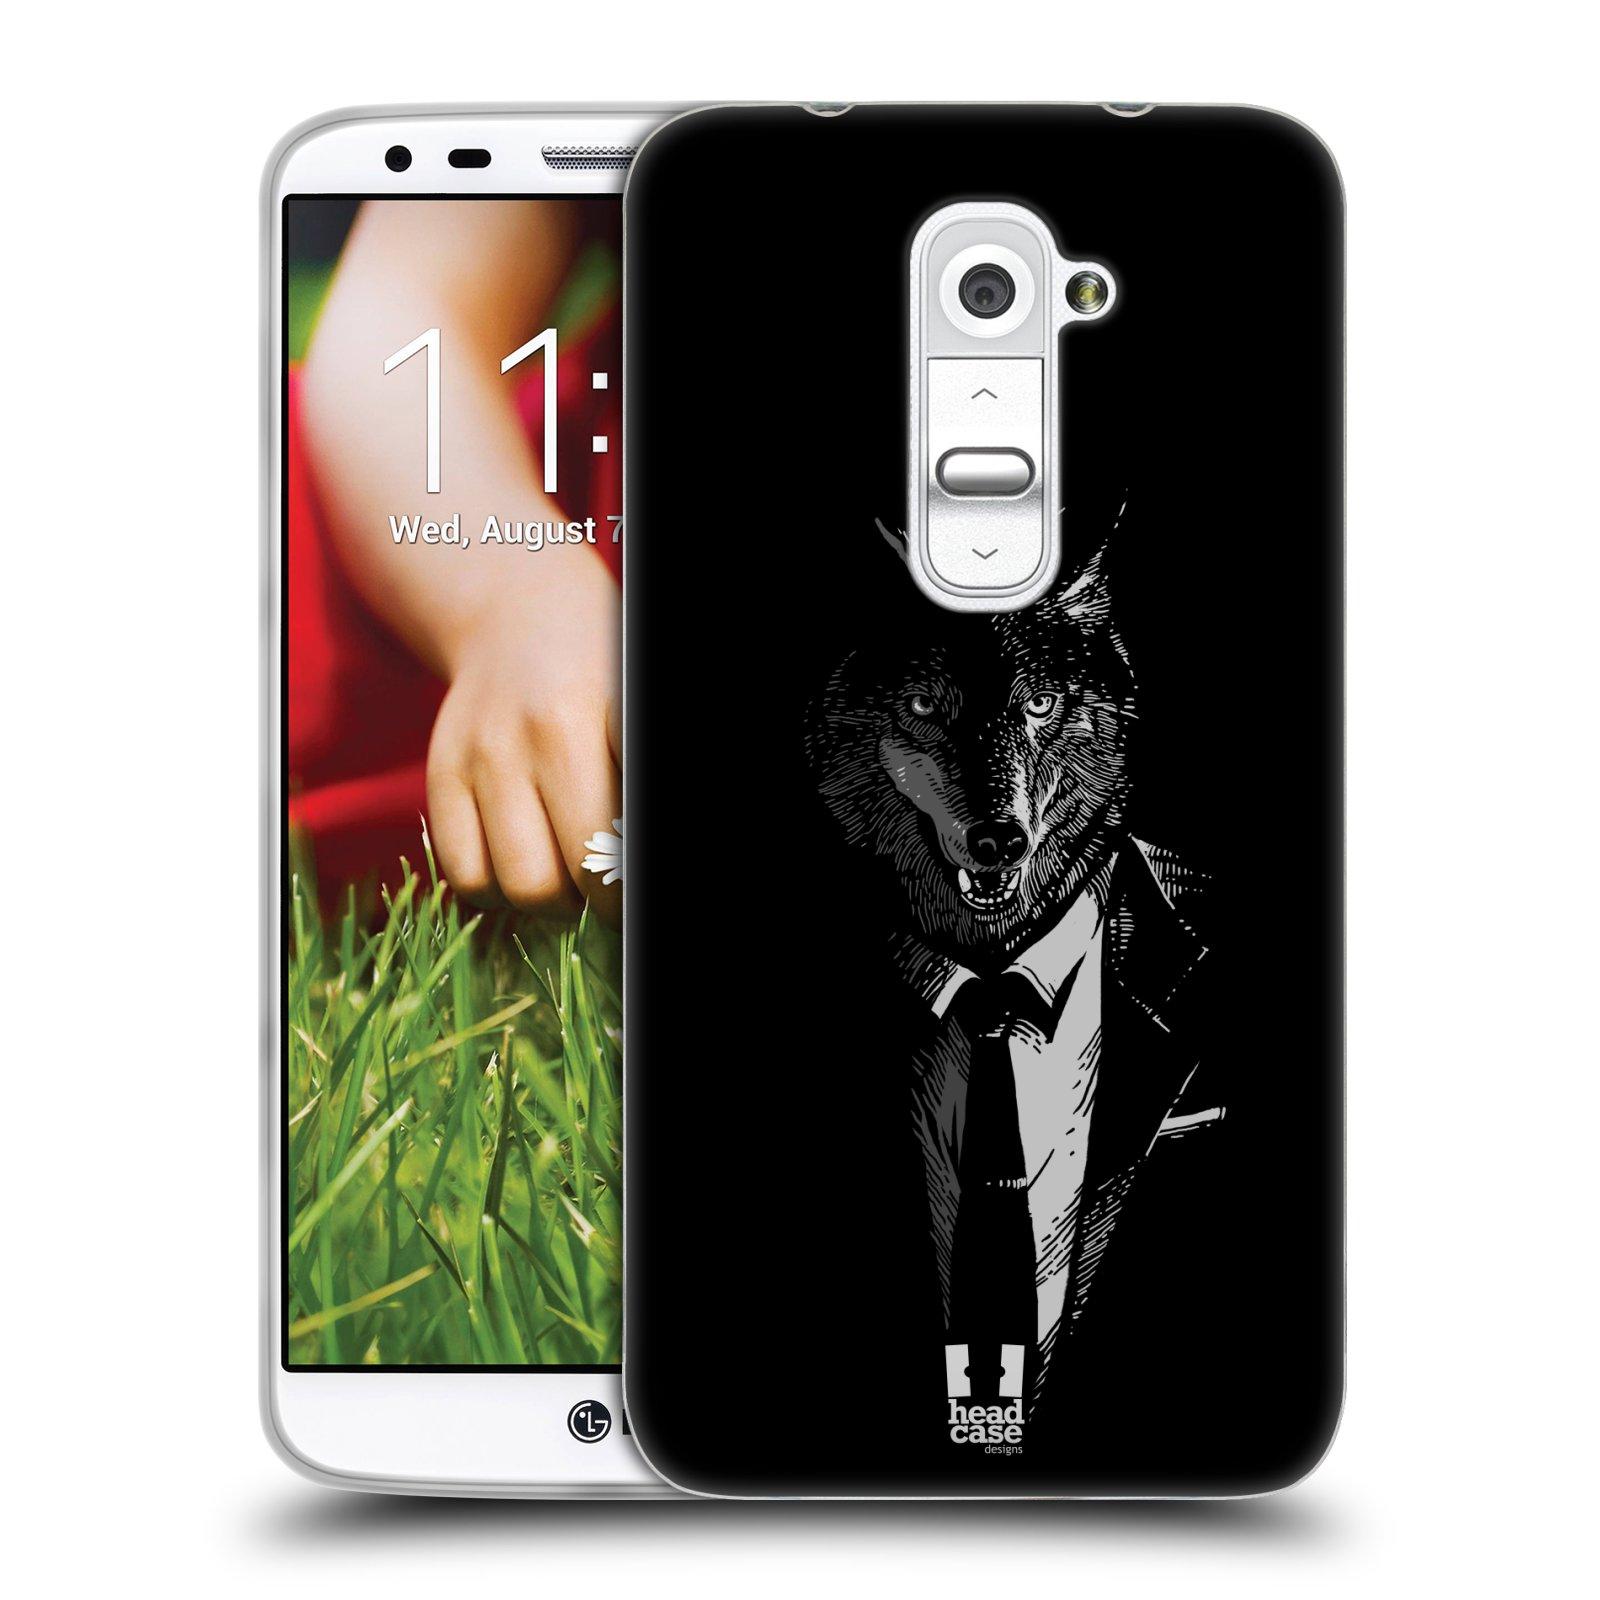 HEAD CASE silikonový obal na mobil LG G2 vzor Zvíře v obleku vlk